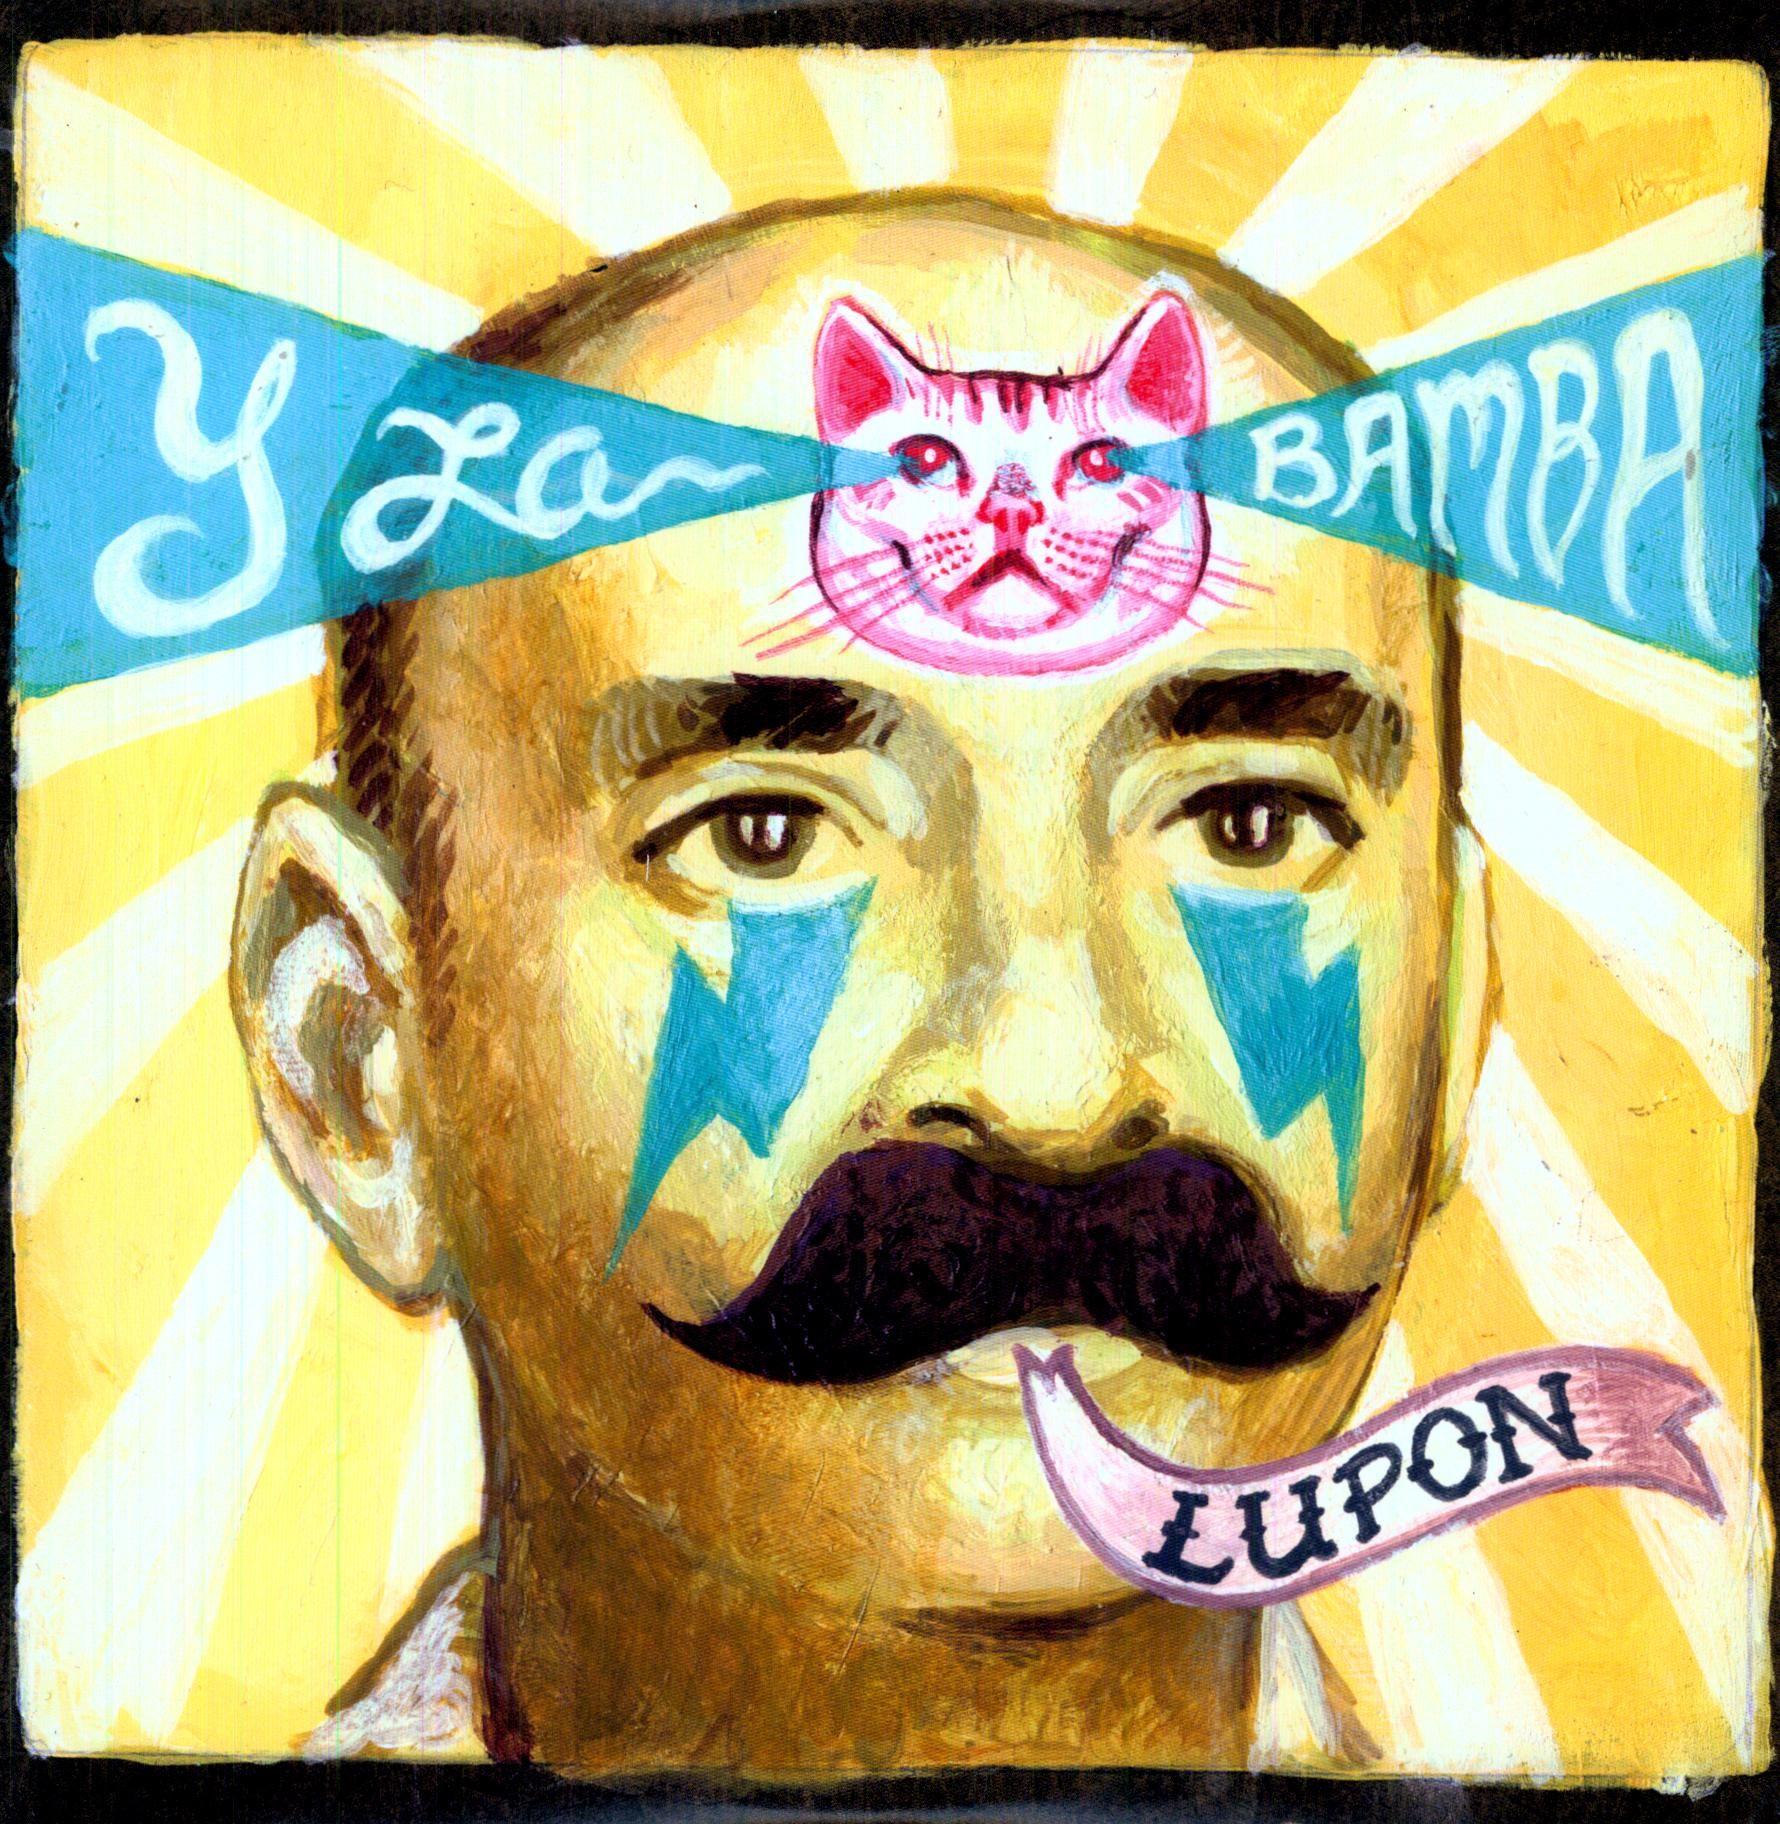 Y La Bamba - Lupon